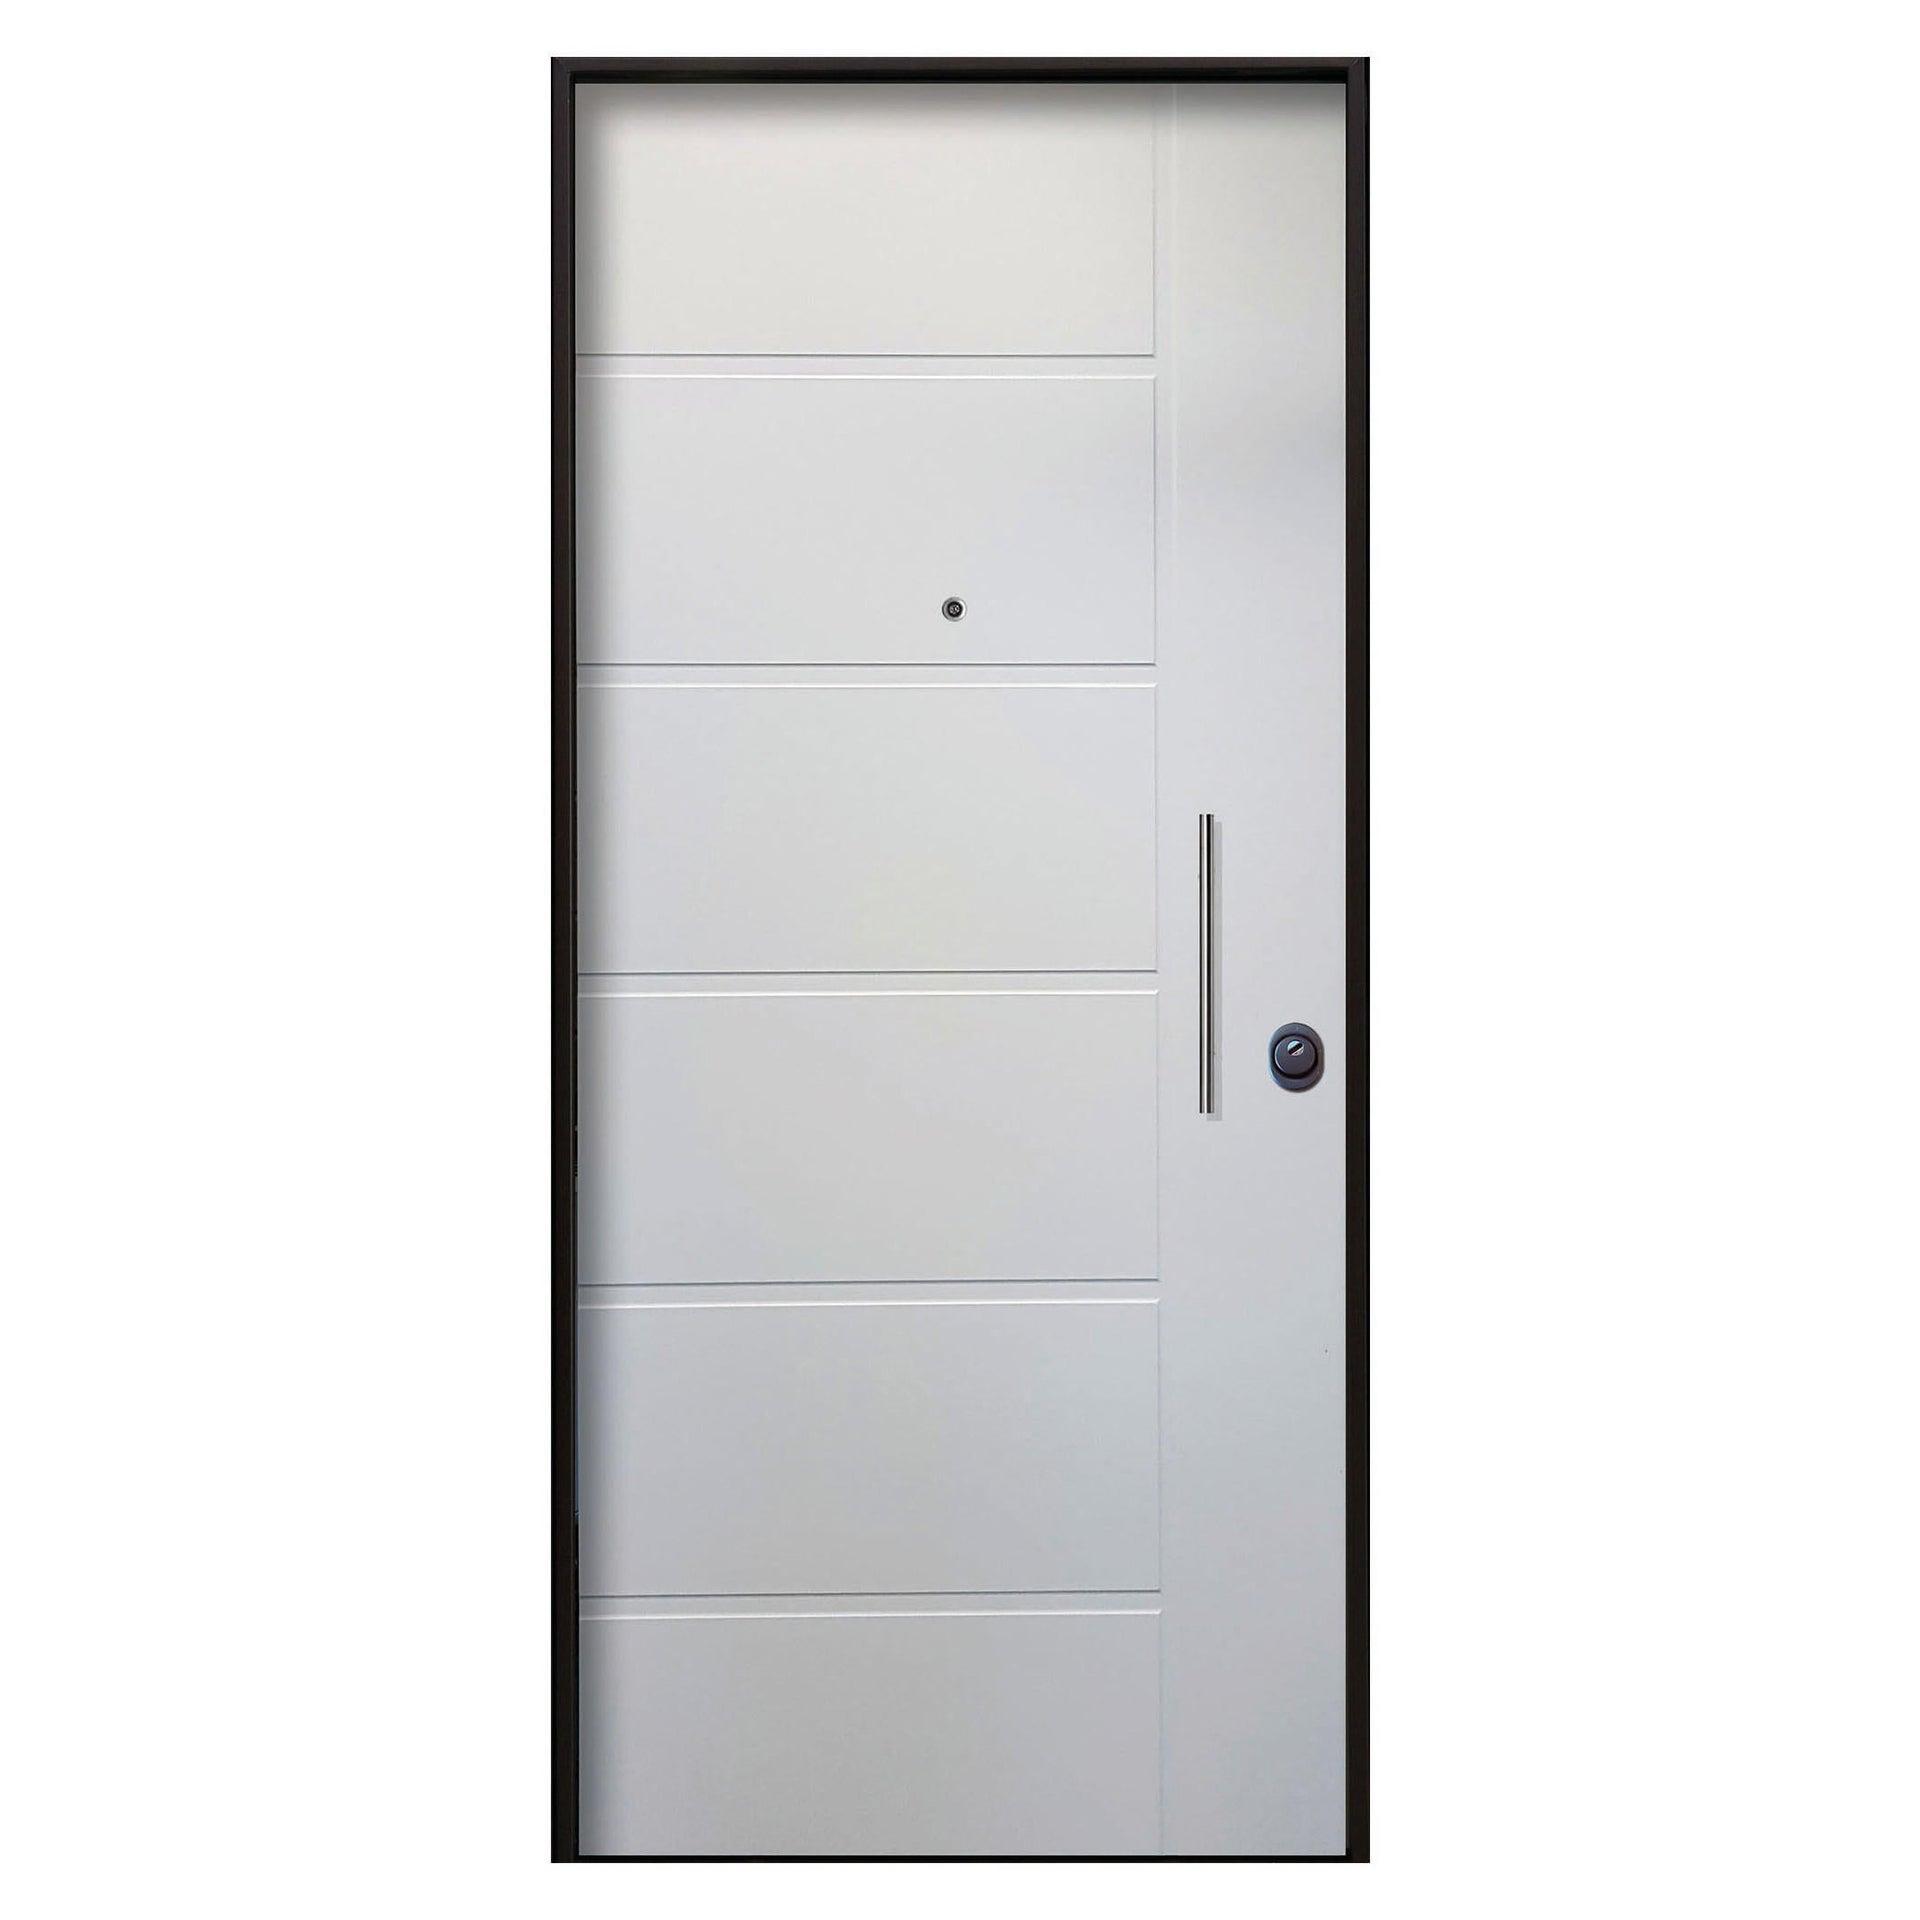 Porta blindata Sweet bianco L 80 x H 210 cm sinistra - 3